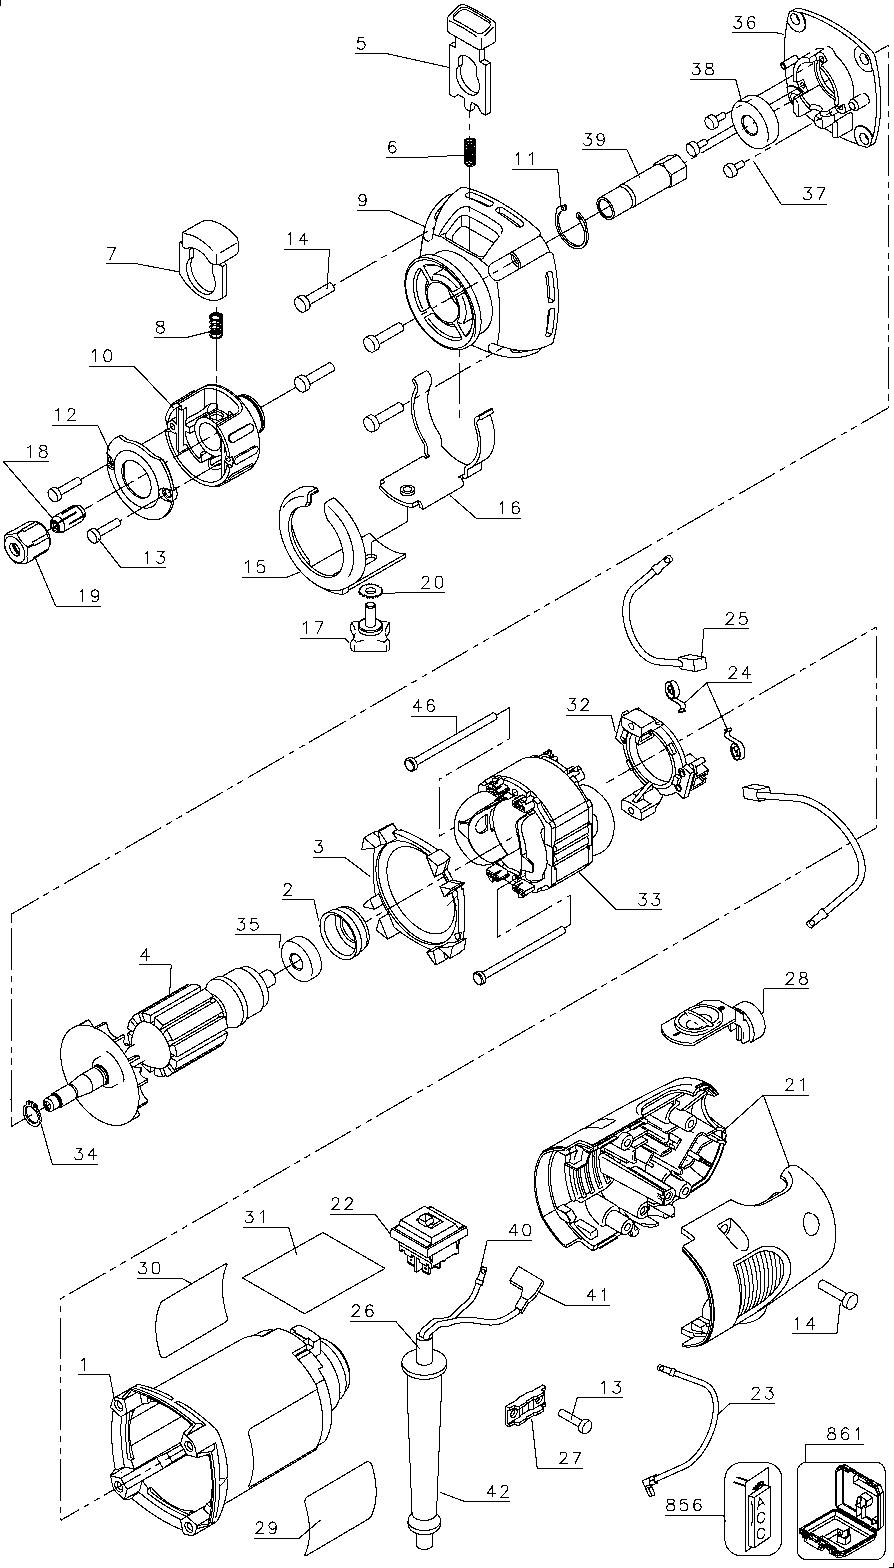 Dewalt guns parts, dw660 parts, drywall tools, drywall router ...